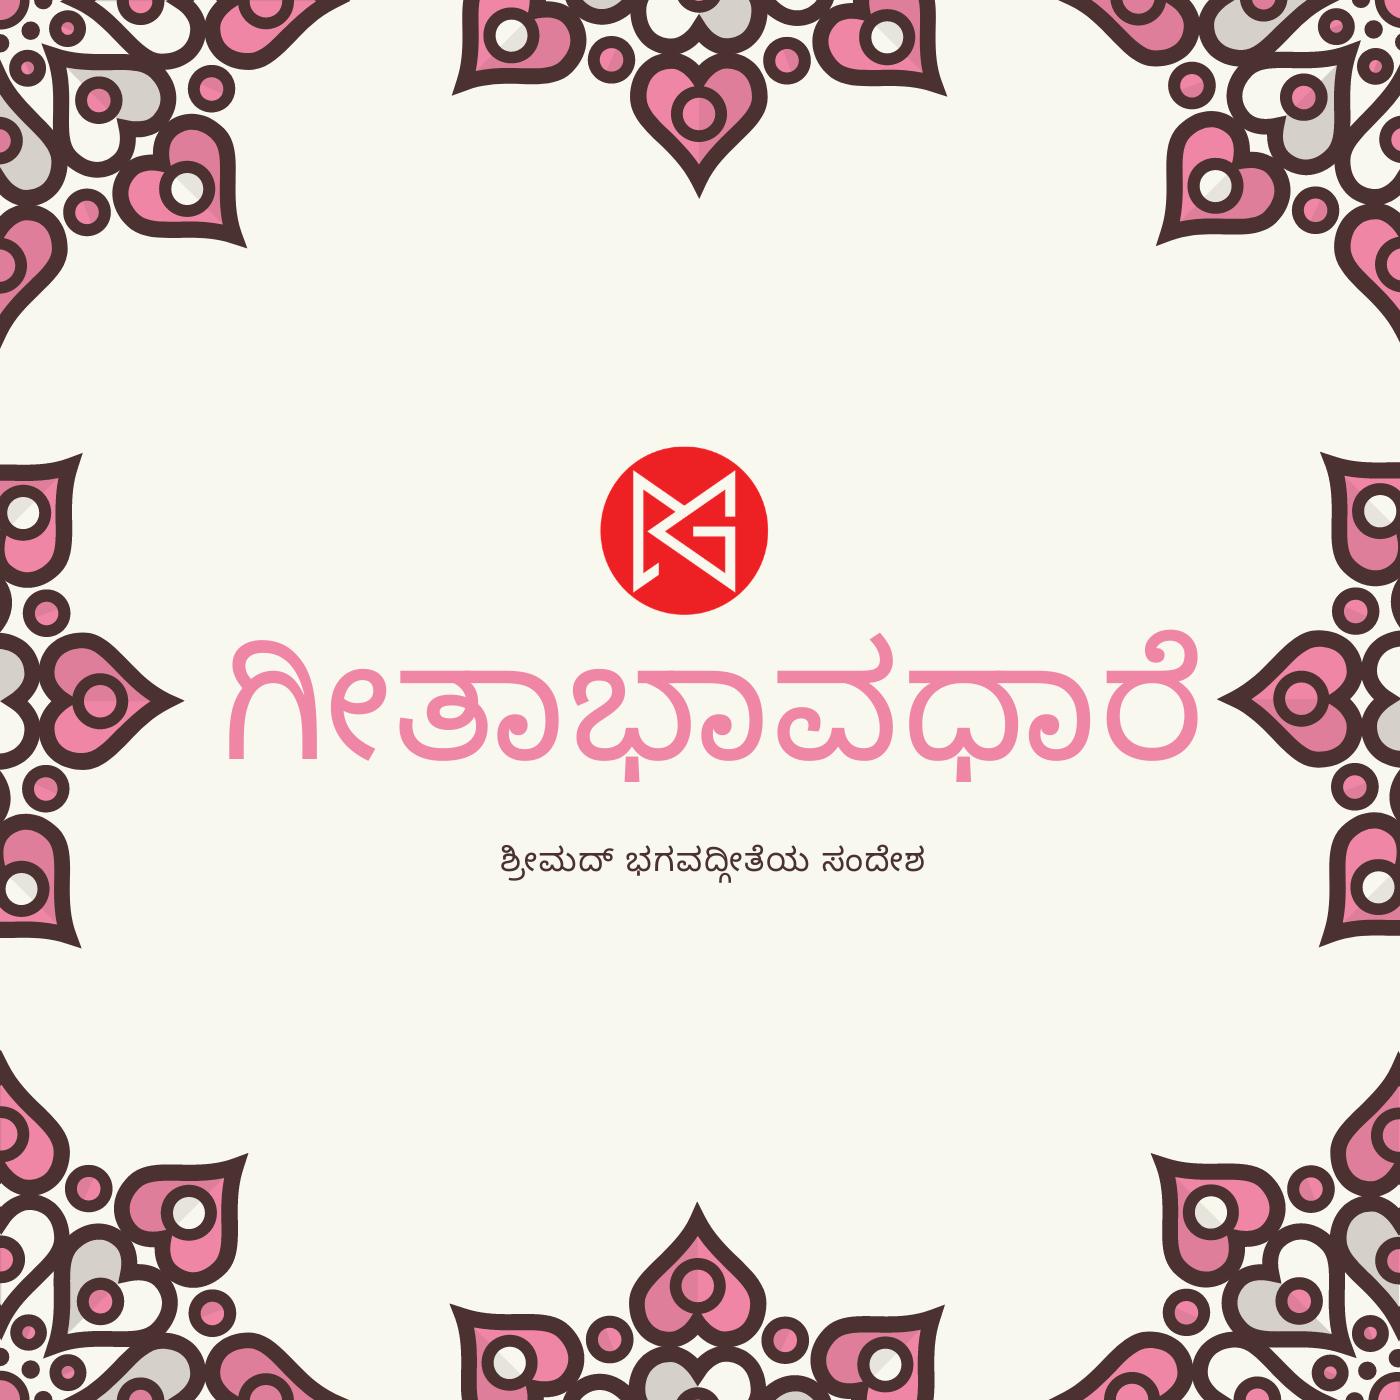 Geetabhavadhare – Radio Girmit